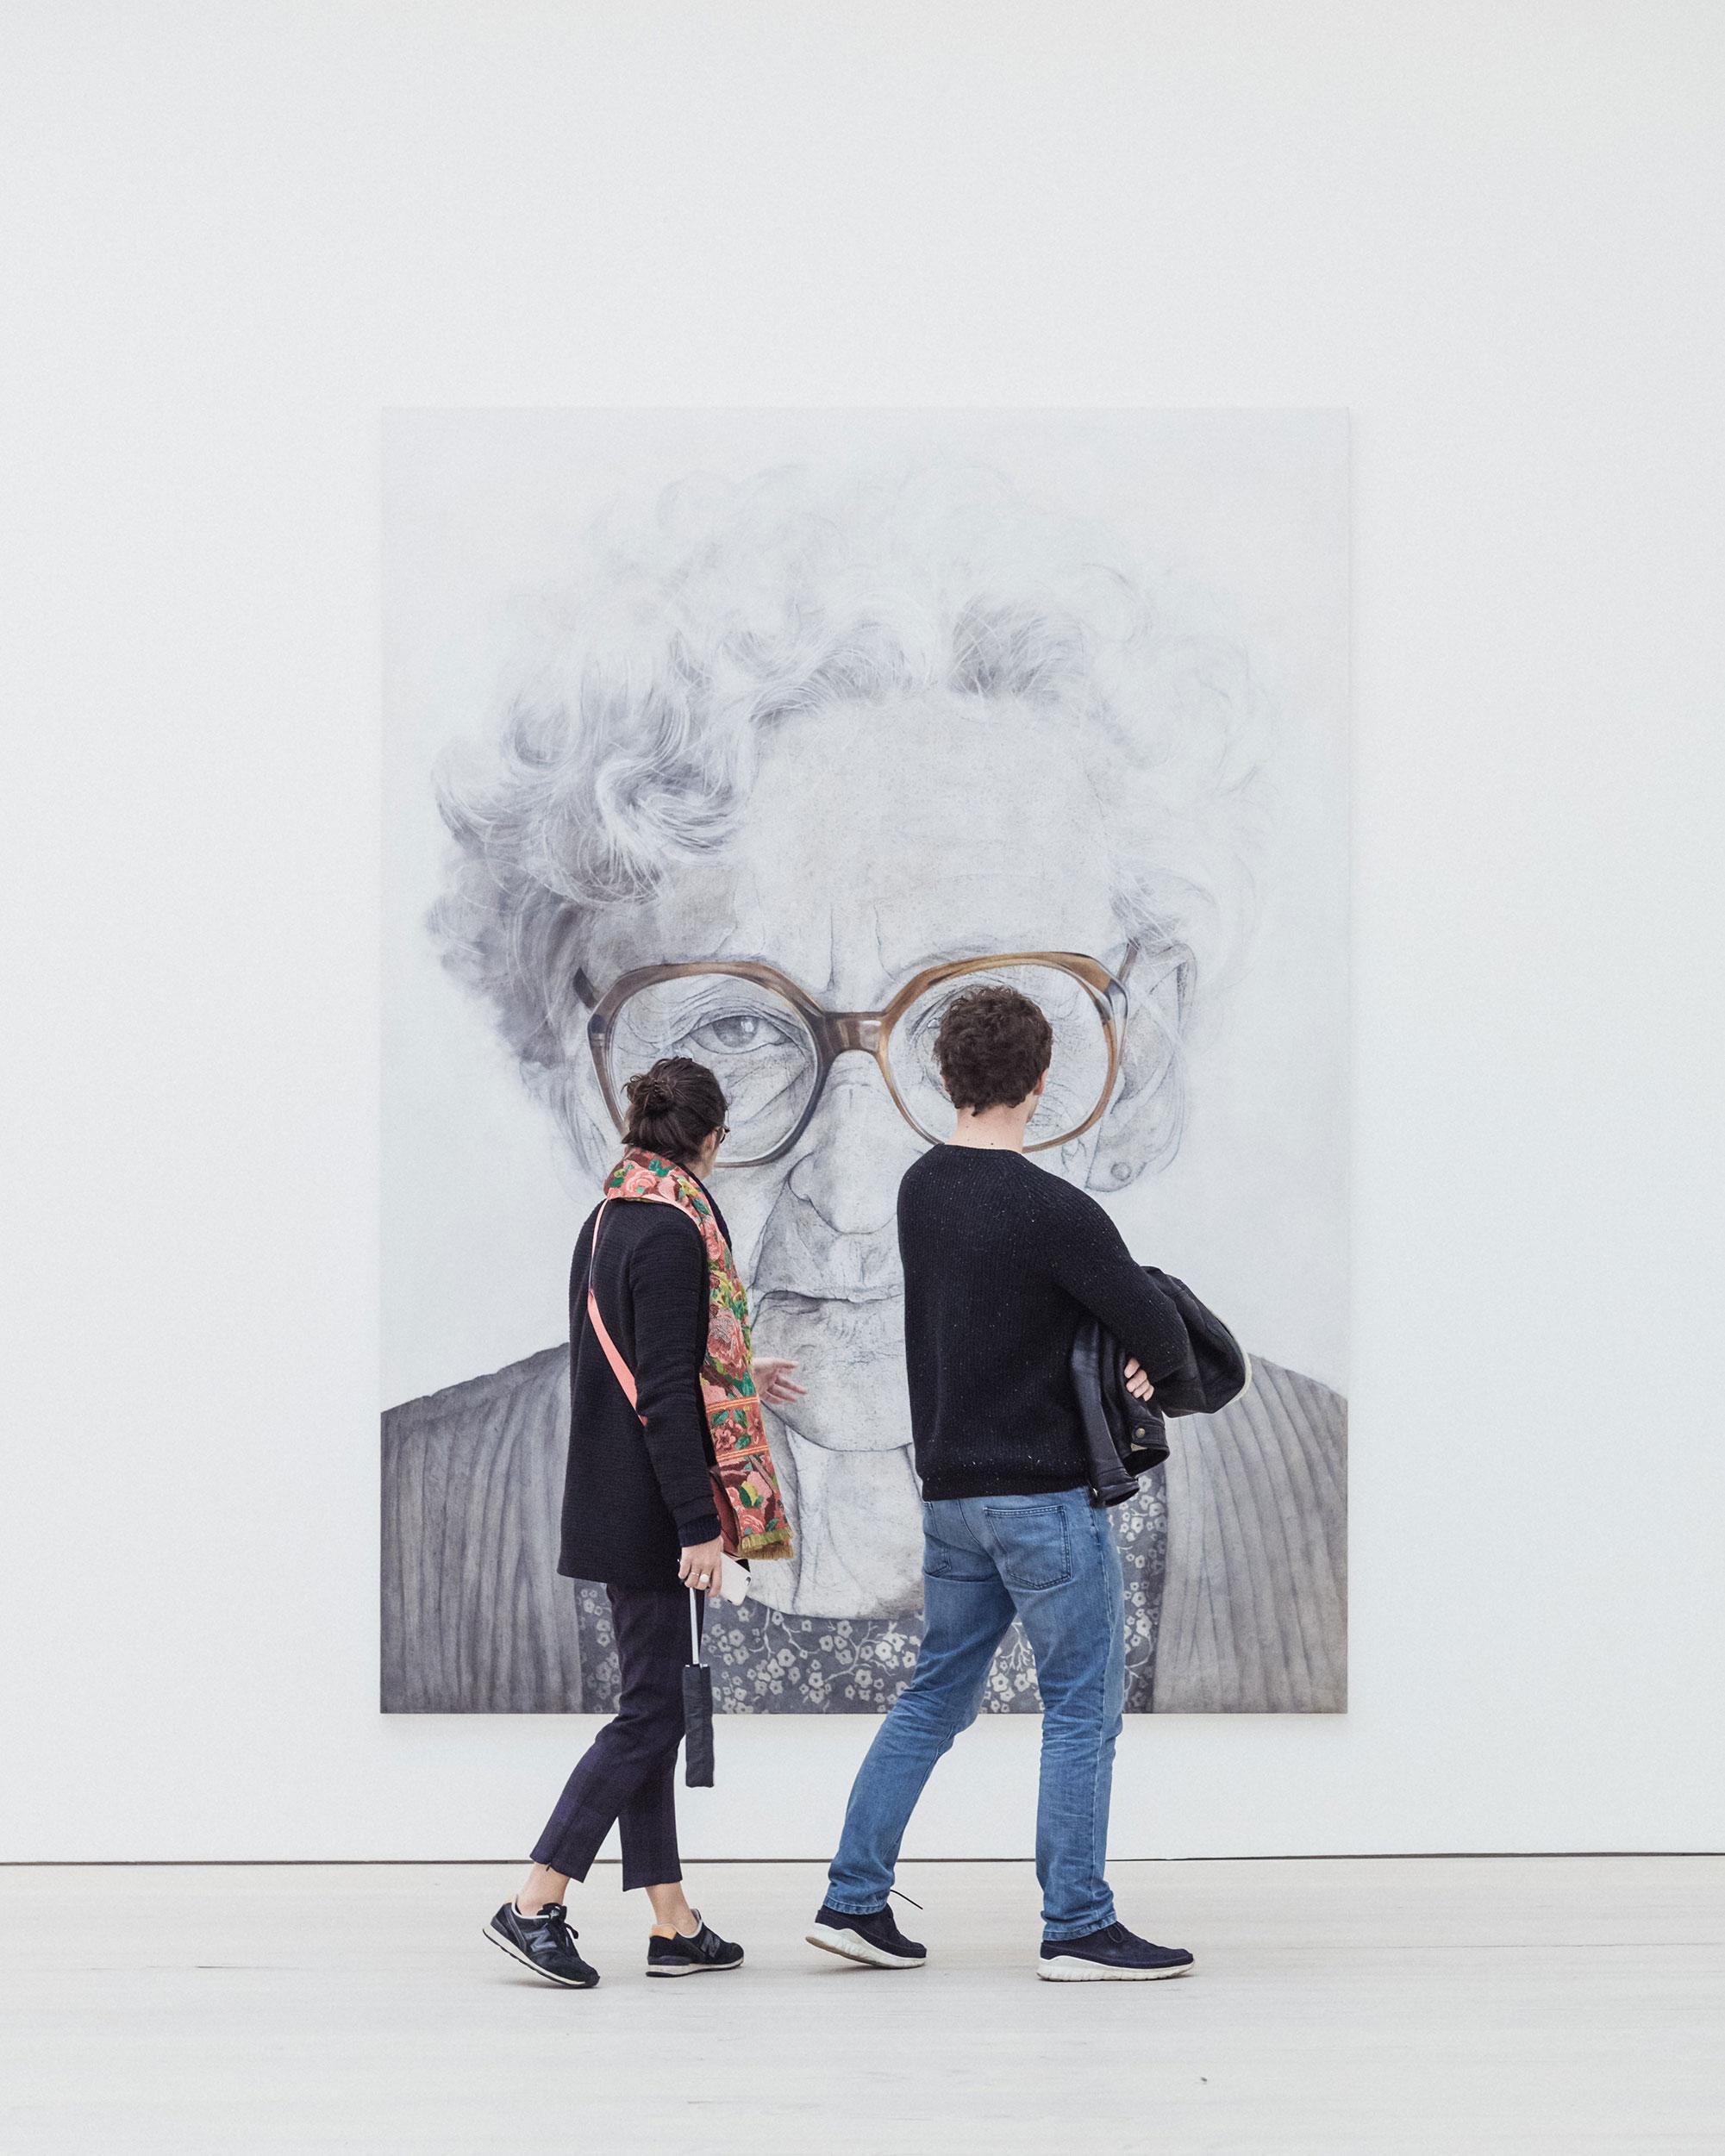 To mennesker ser på kunstbilde